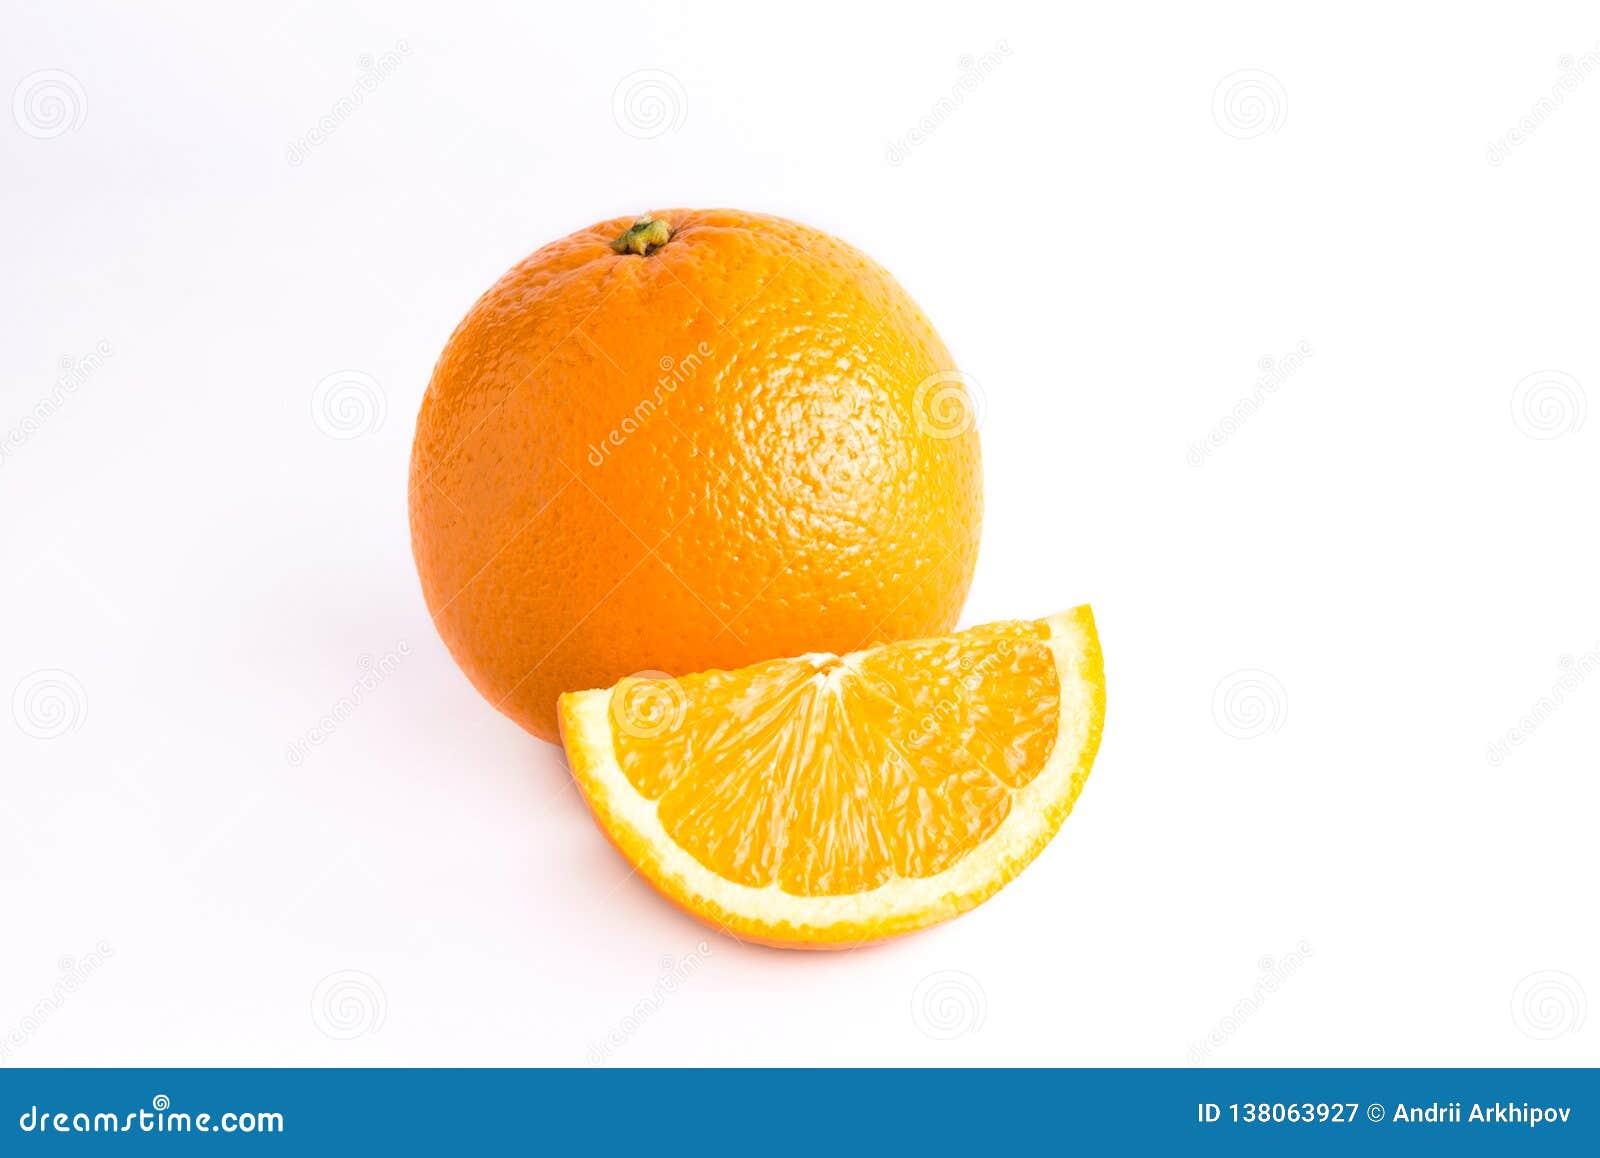 Naranja fresca jugosa y una rebanada anaranjada